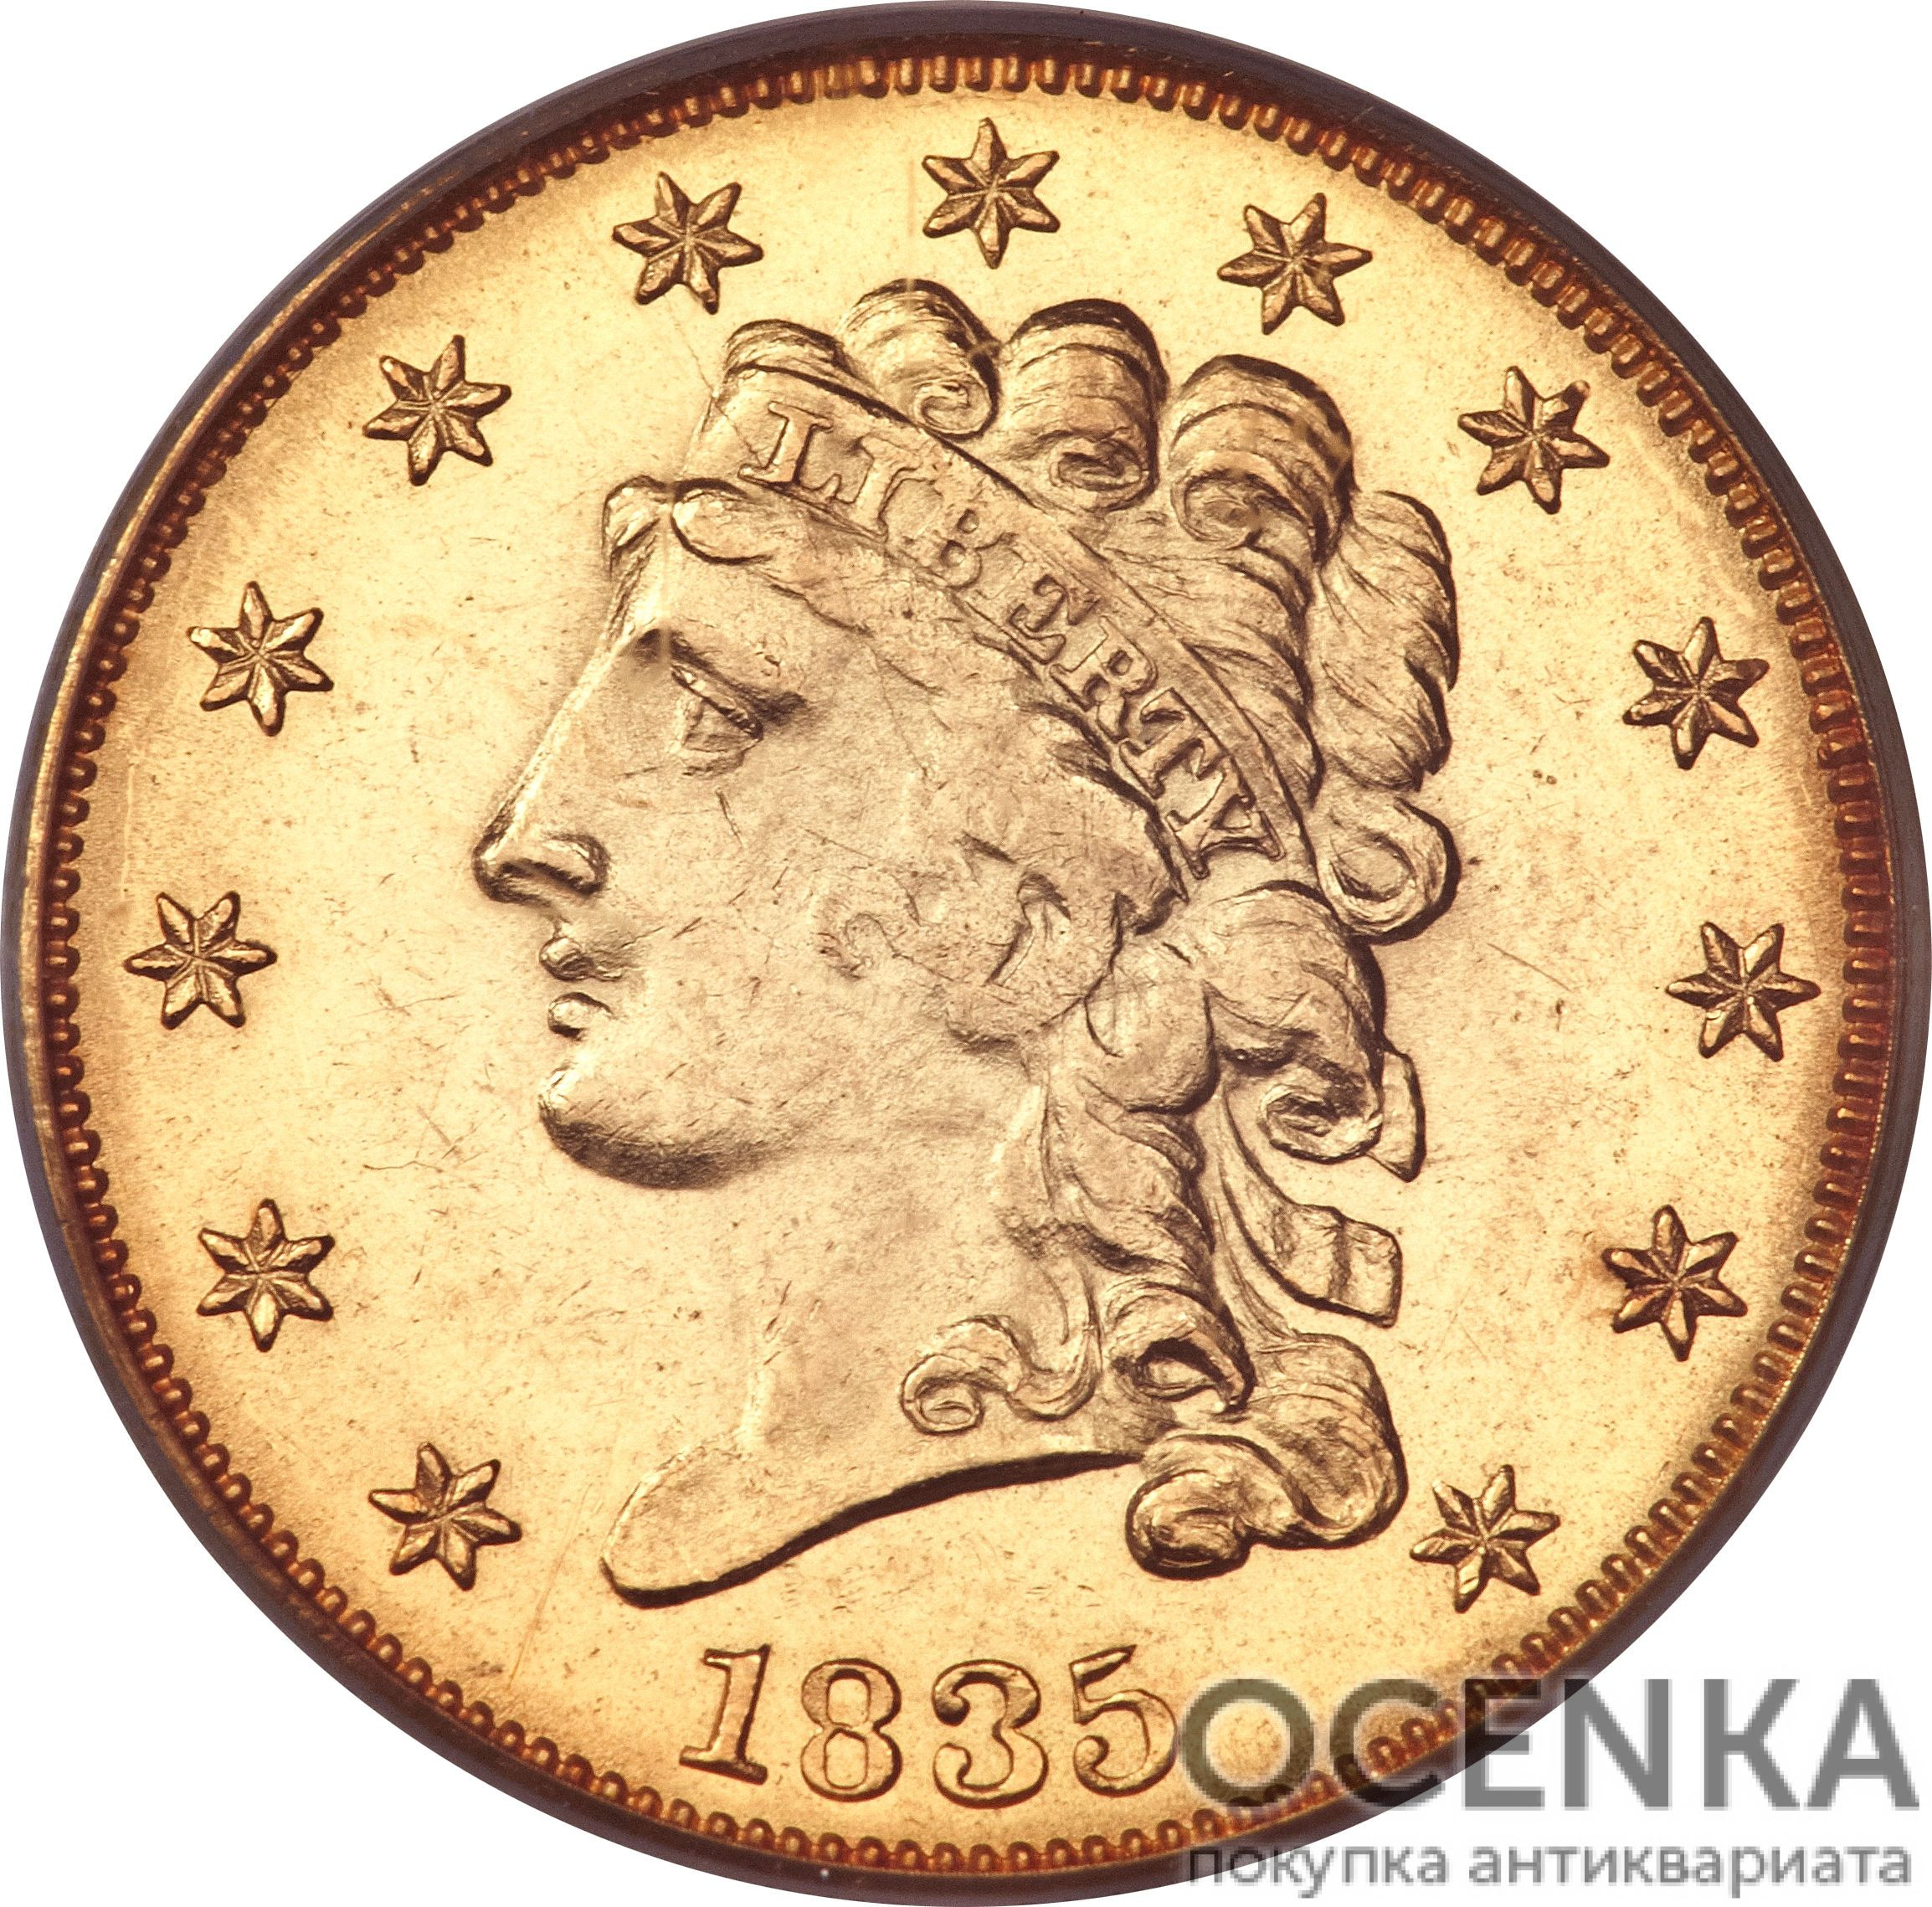 Золотая монета 2½ Dollars (2,5 доллара) США - 5